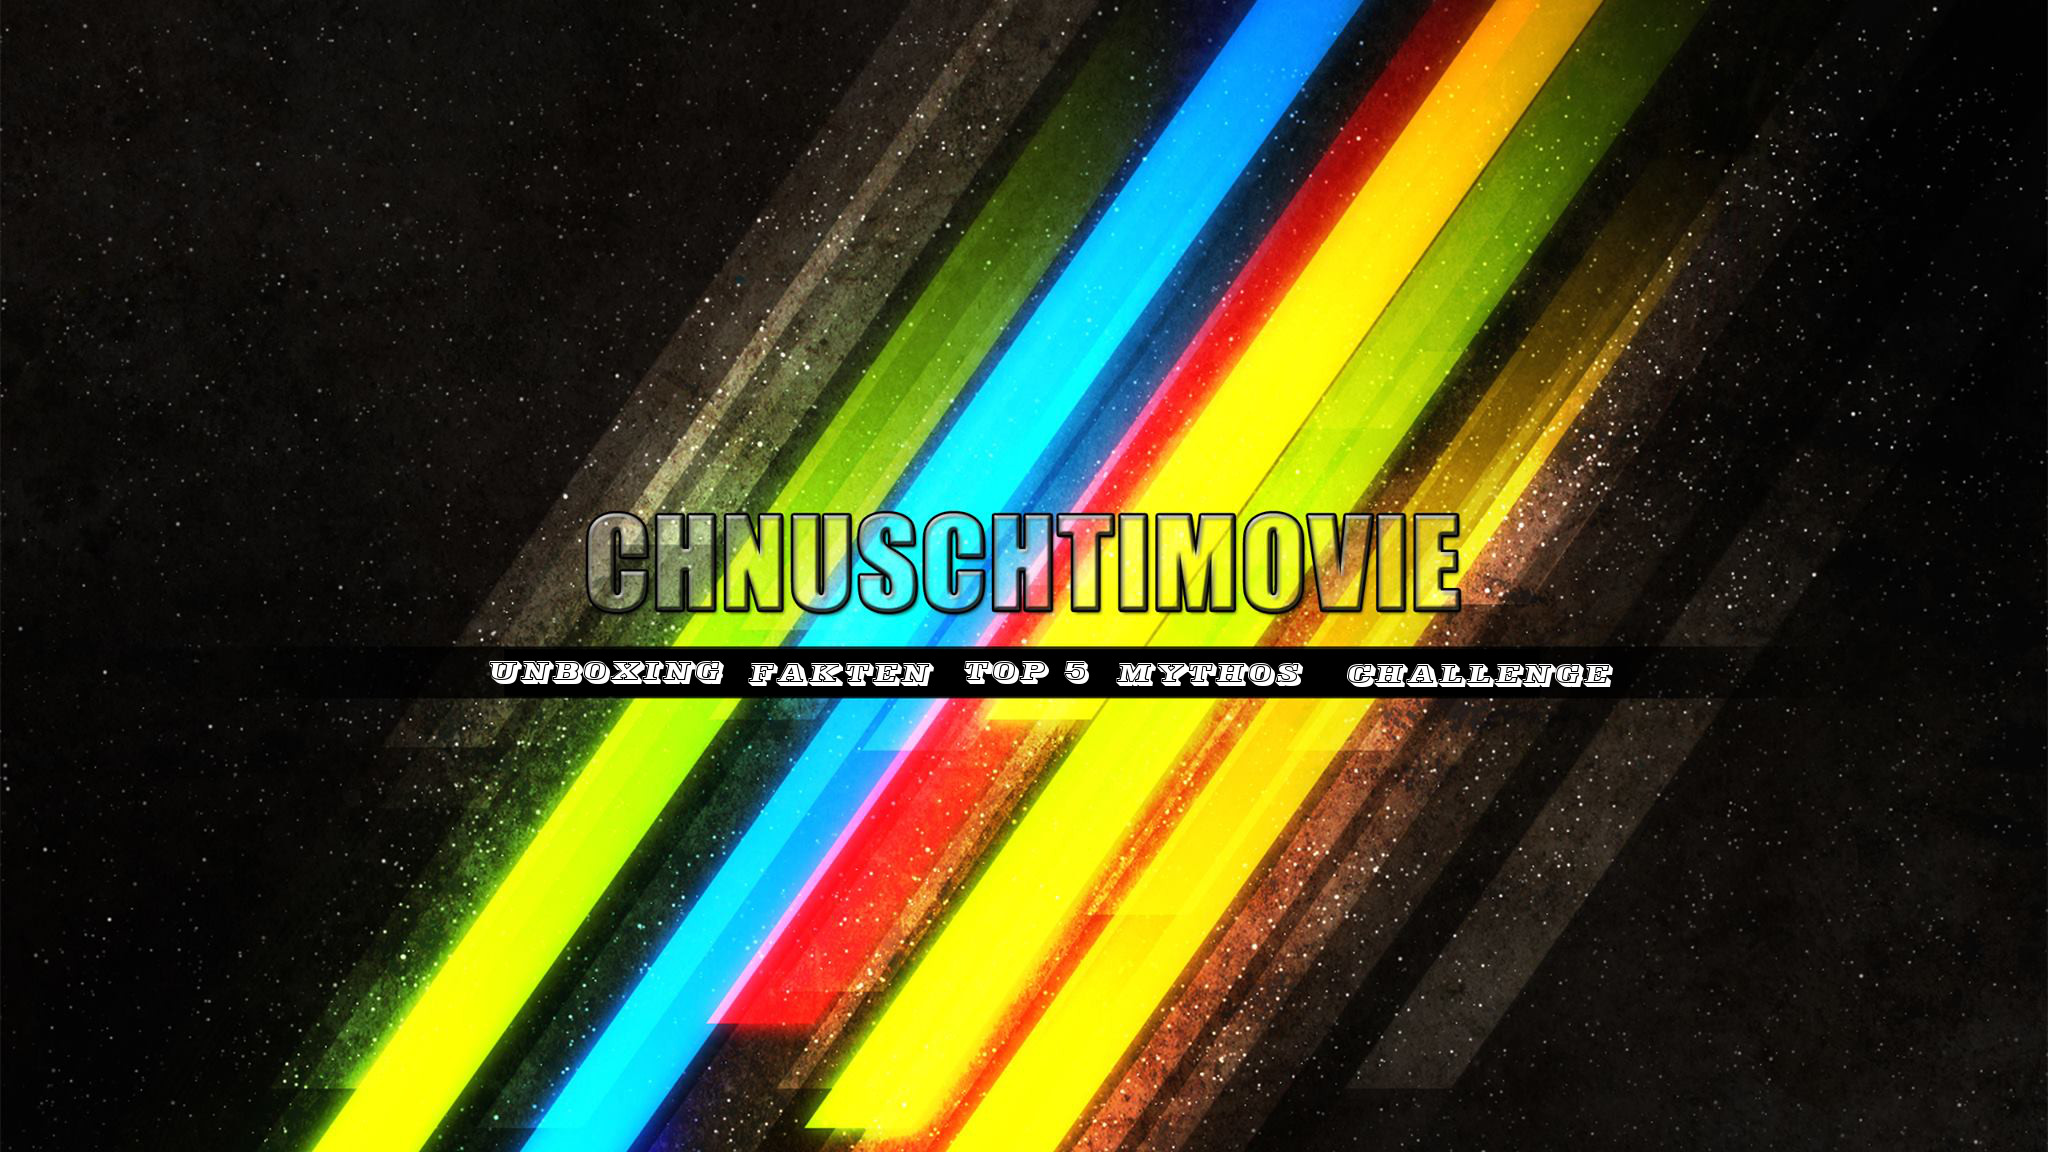 Chnuschti-Movie.jpg